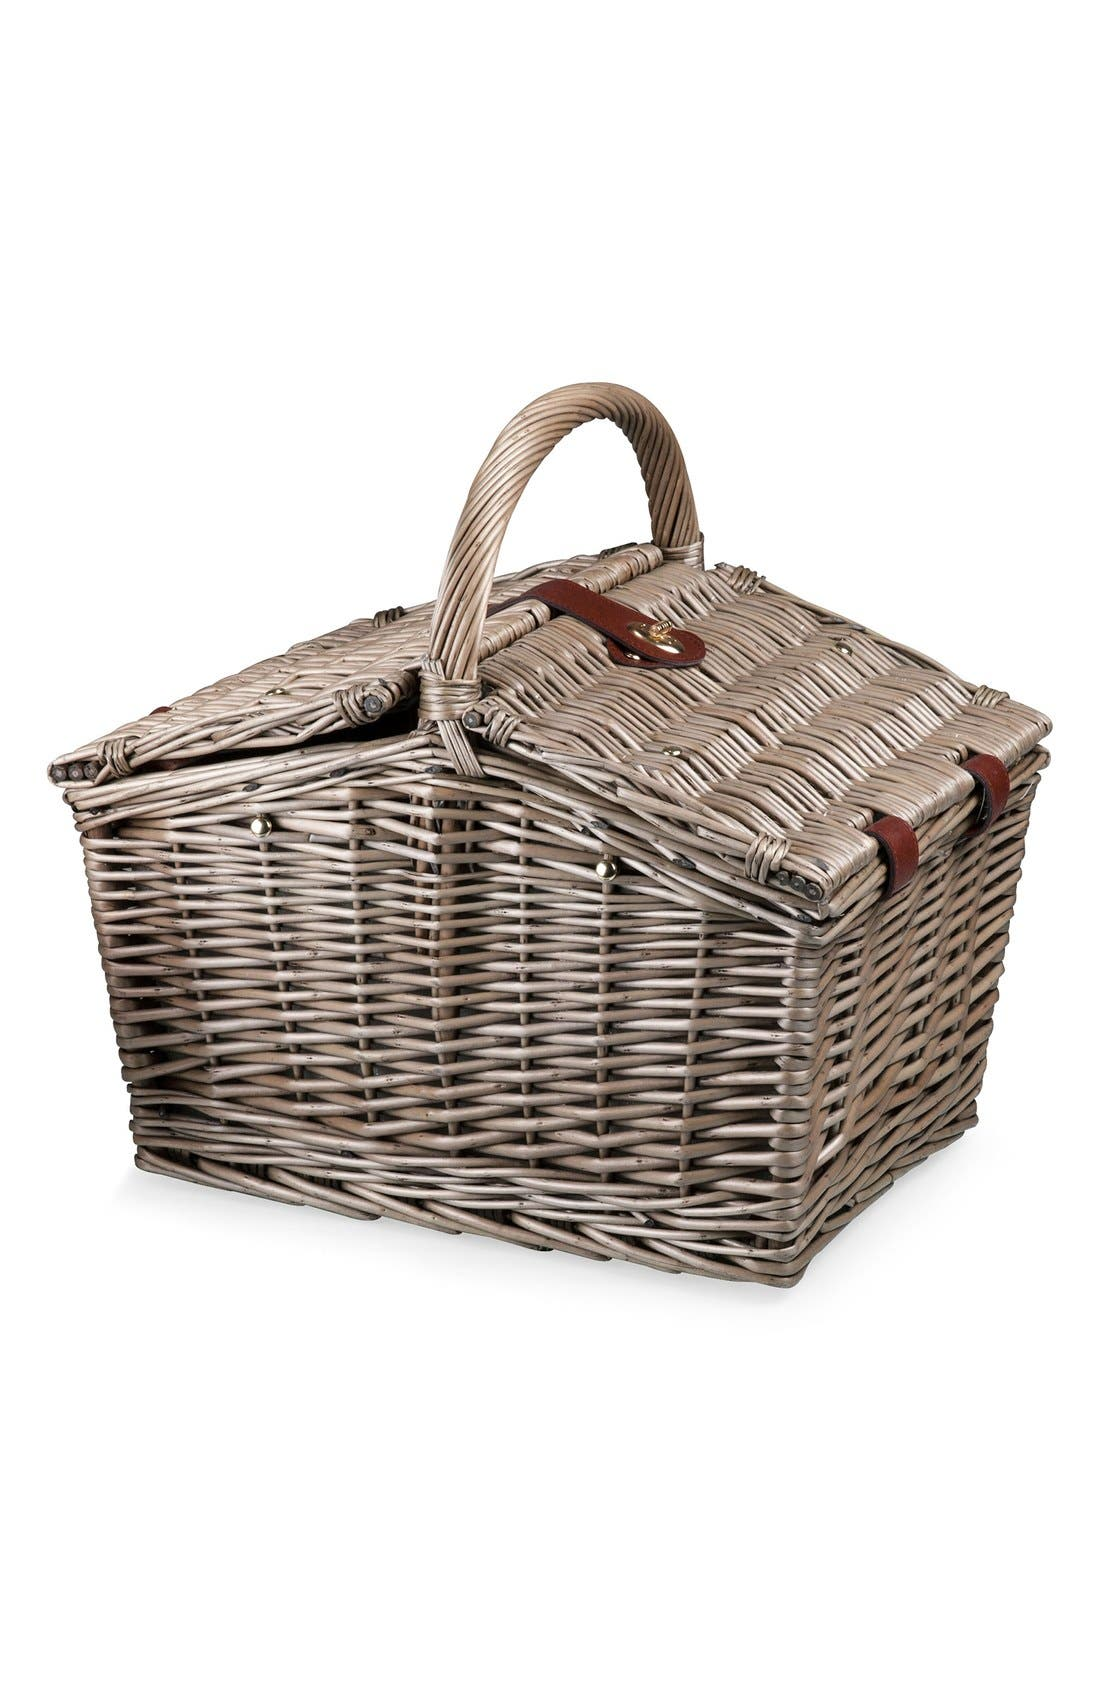 Alternate Image 3  - Picnic Time 'Piccadilly' Wicker Picnic Basket